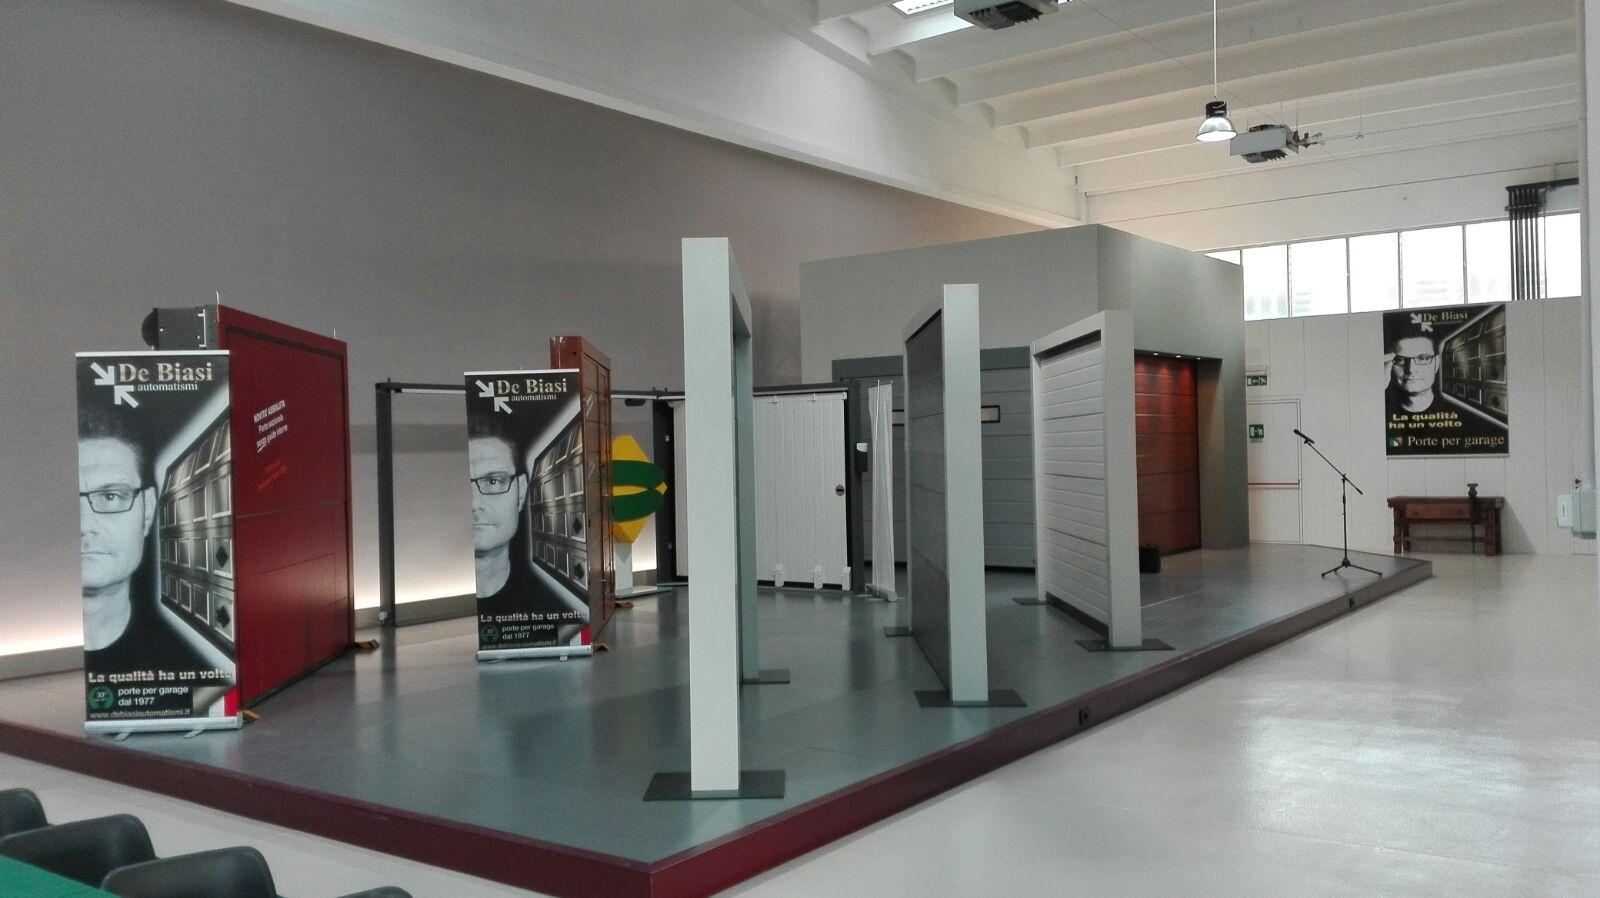 Nuovo showroom per i portoni breda a mantova for Breda portoni